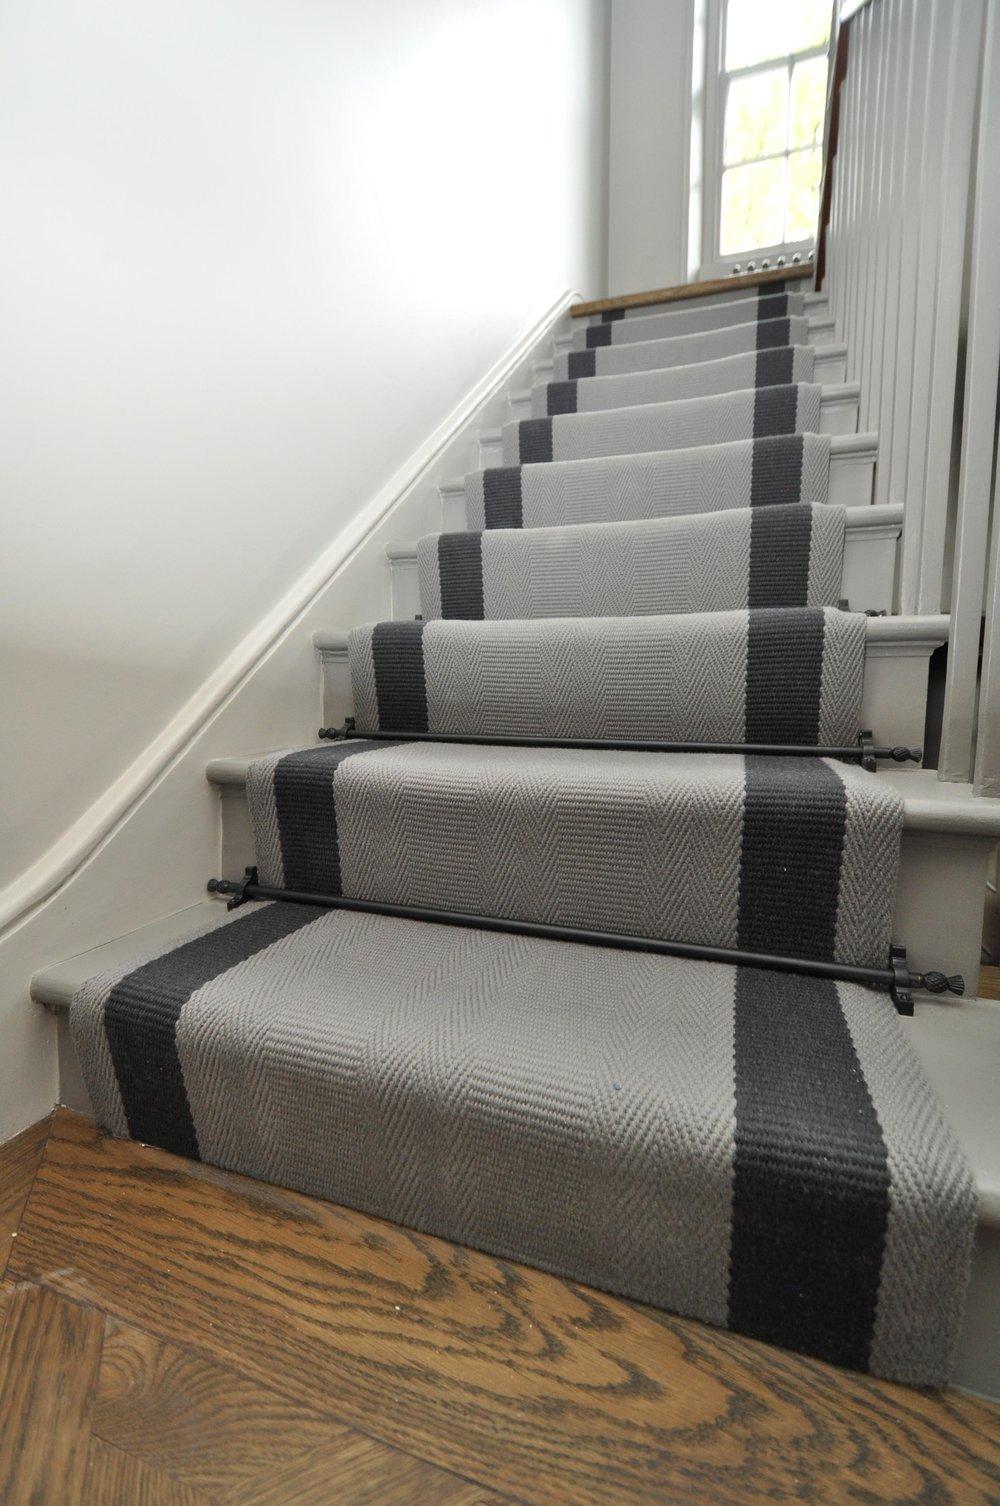 flatweave-stair-runner-london-bowloom-off-the-loom-geometric-carpet-DSC_1140.jpg